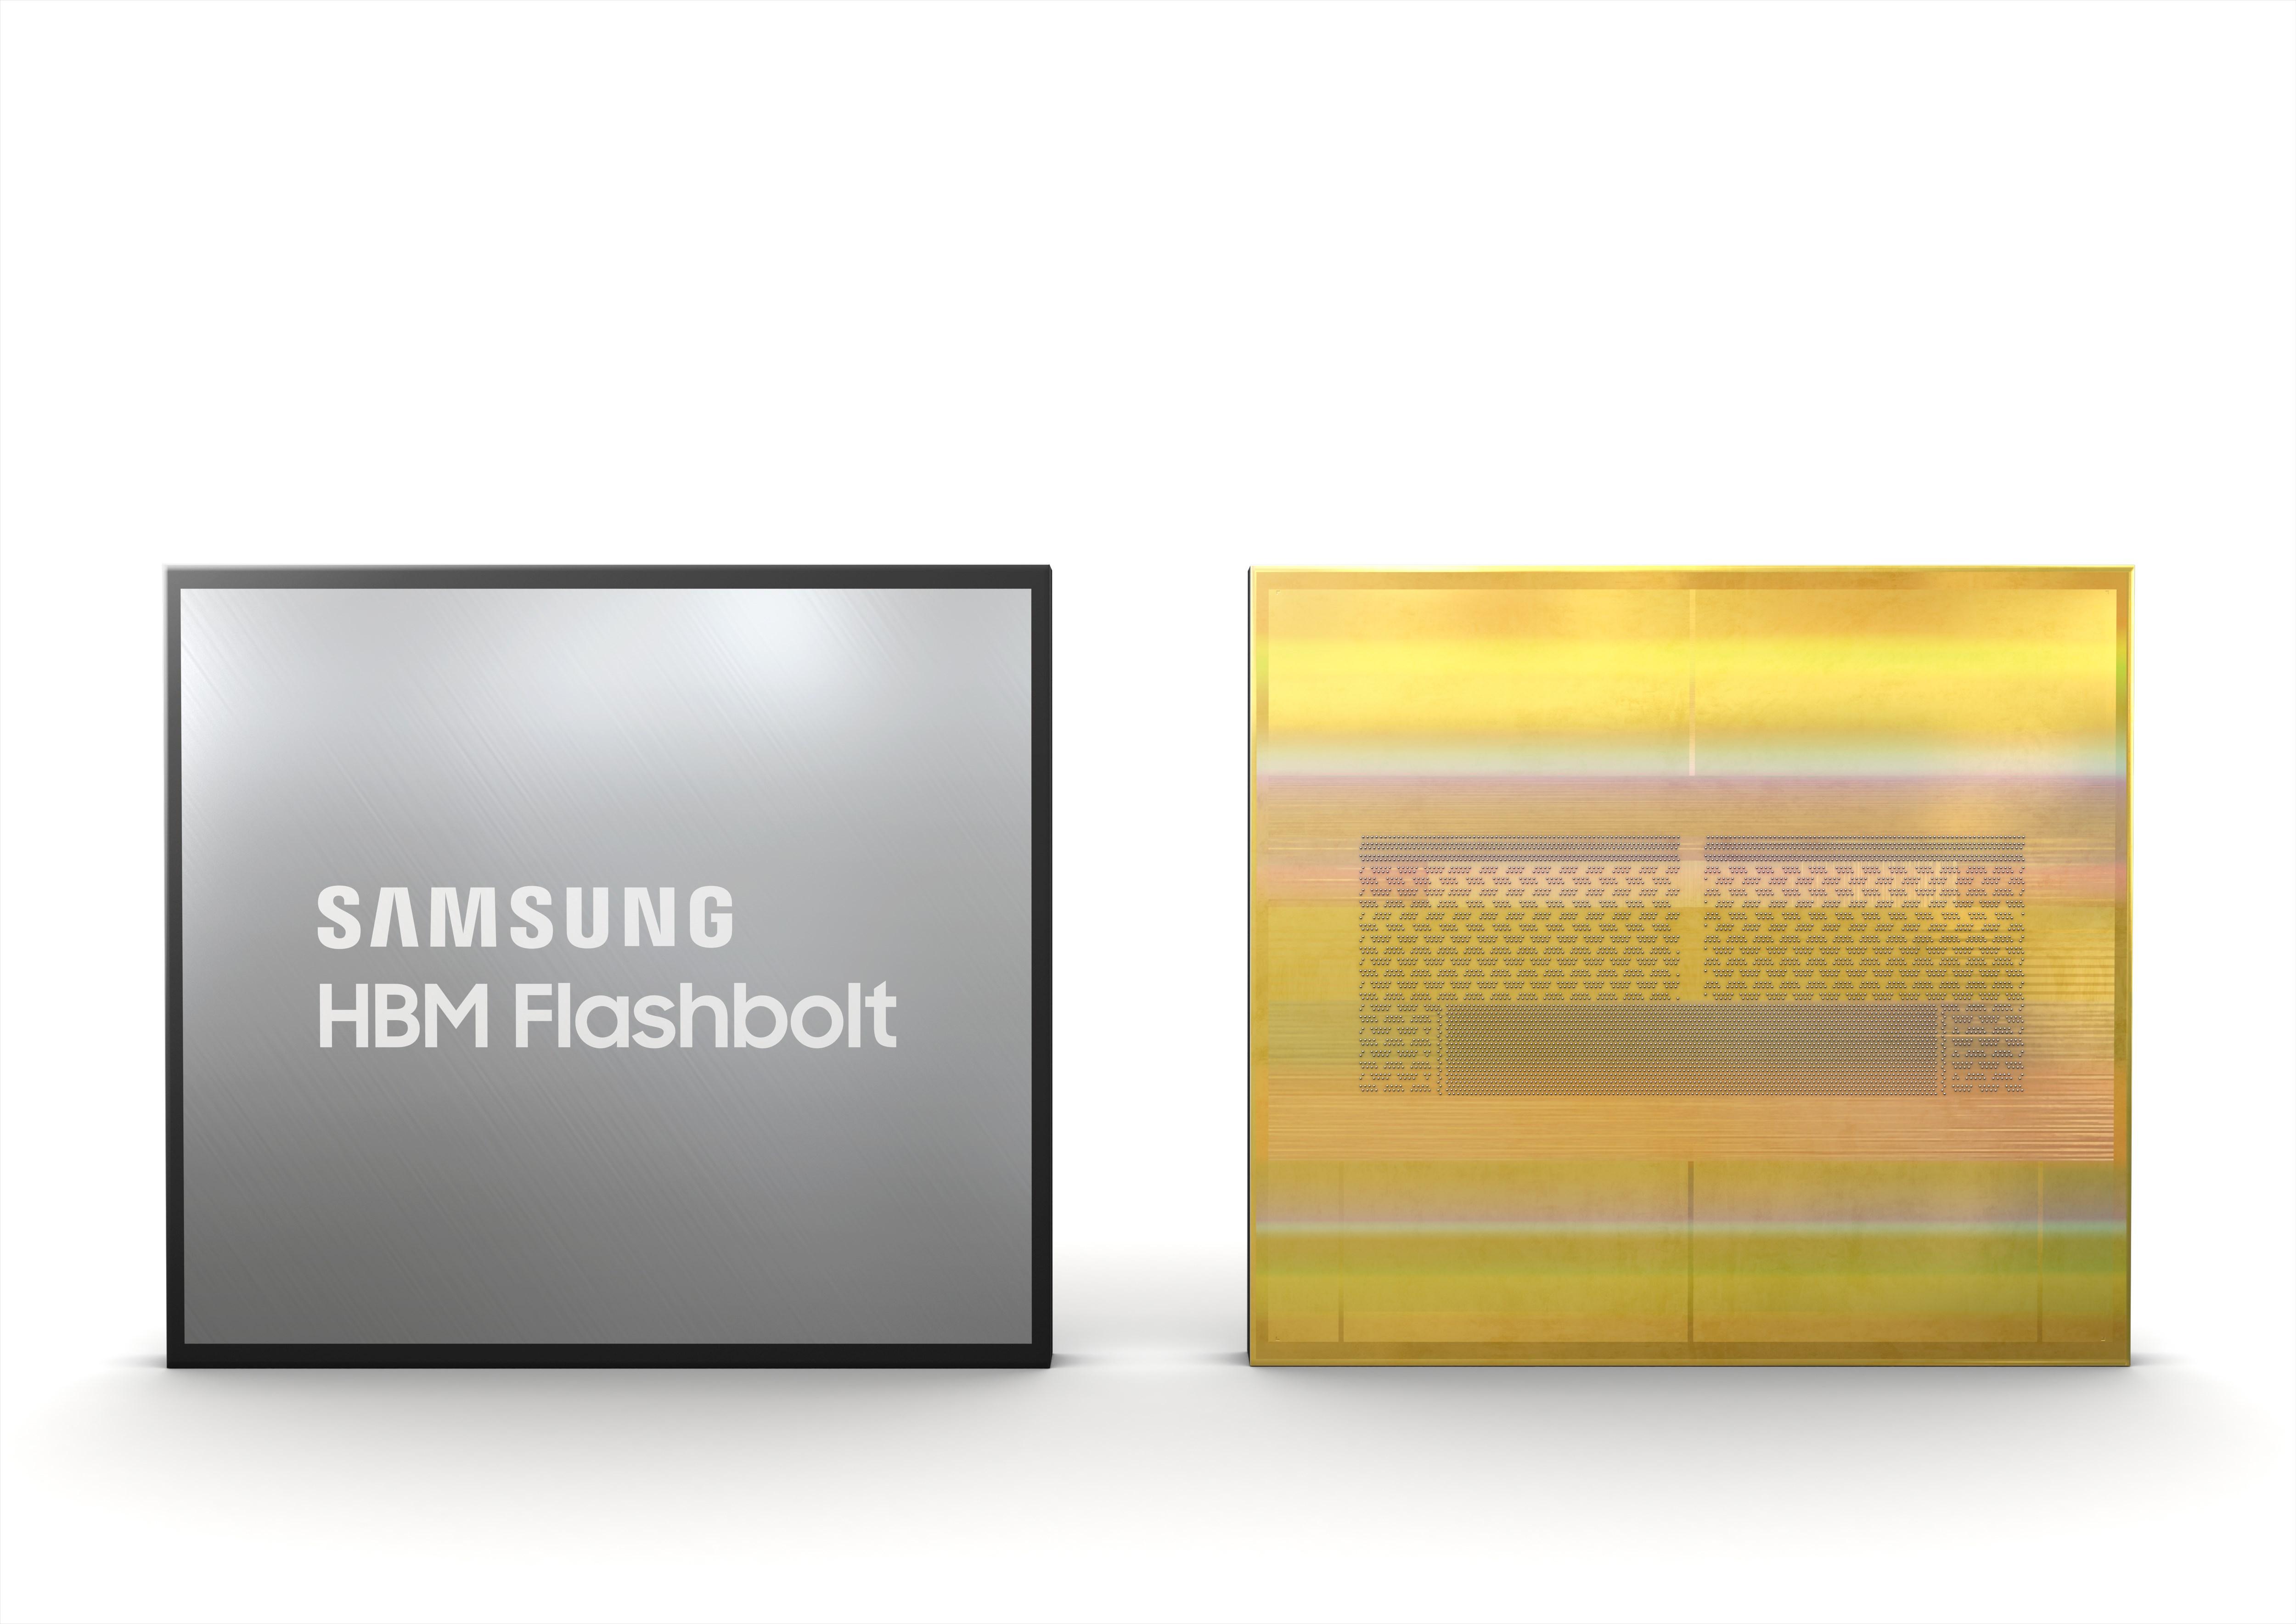 Samsung Flashbolt High Bandwidth Memory 2E (HBM2E)